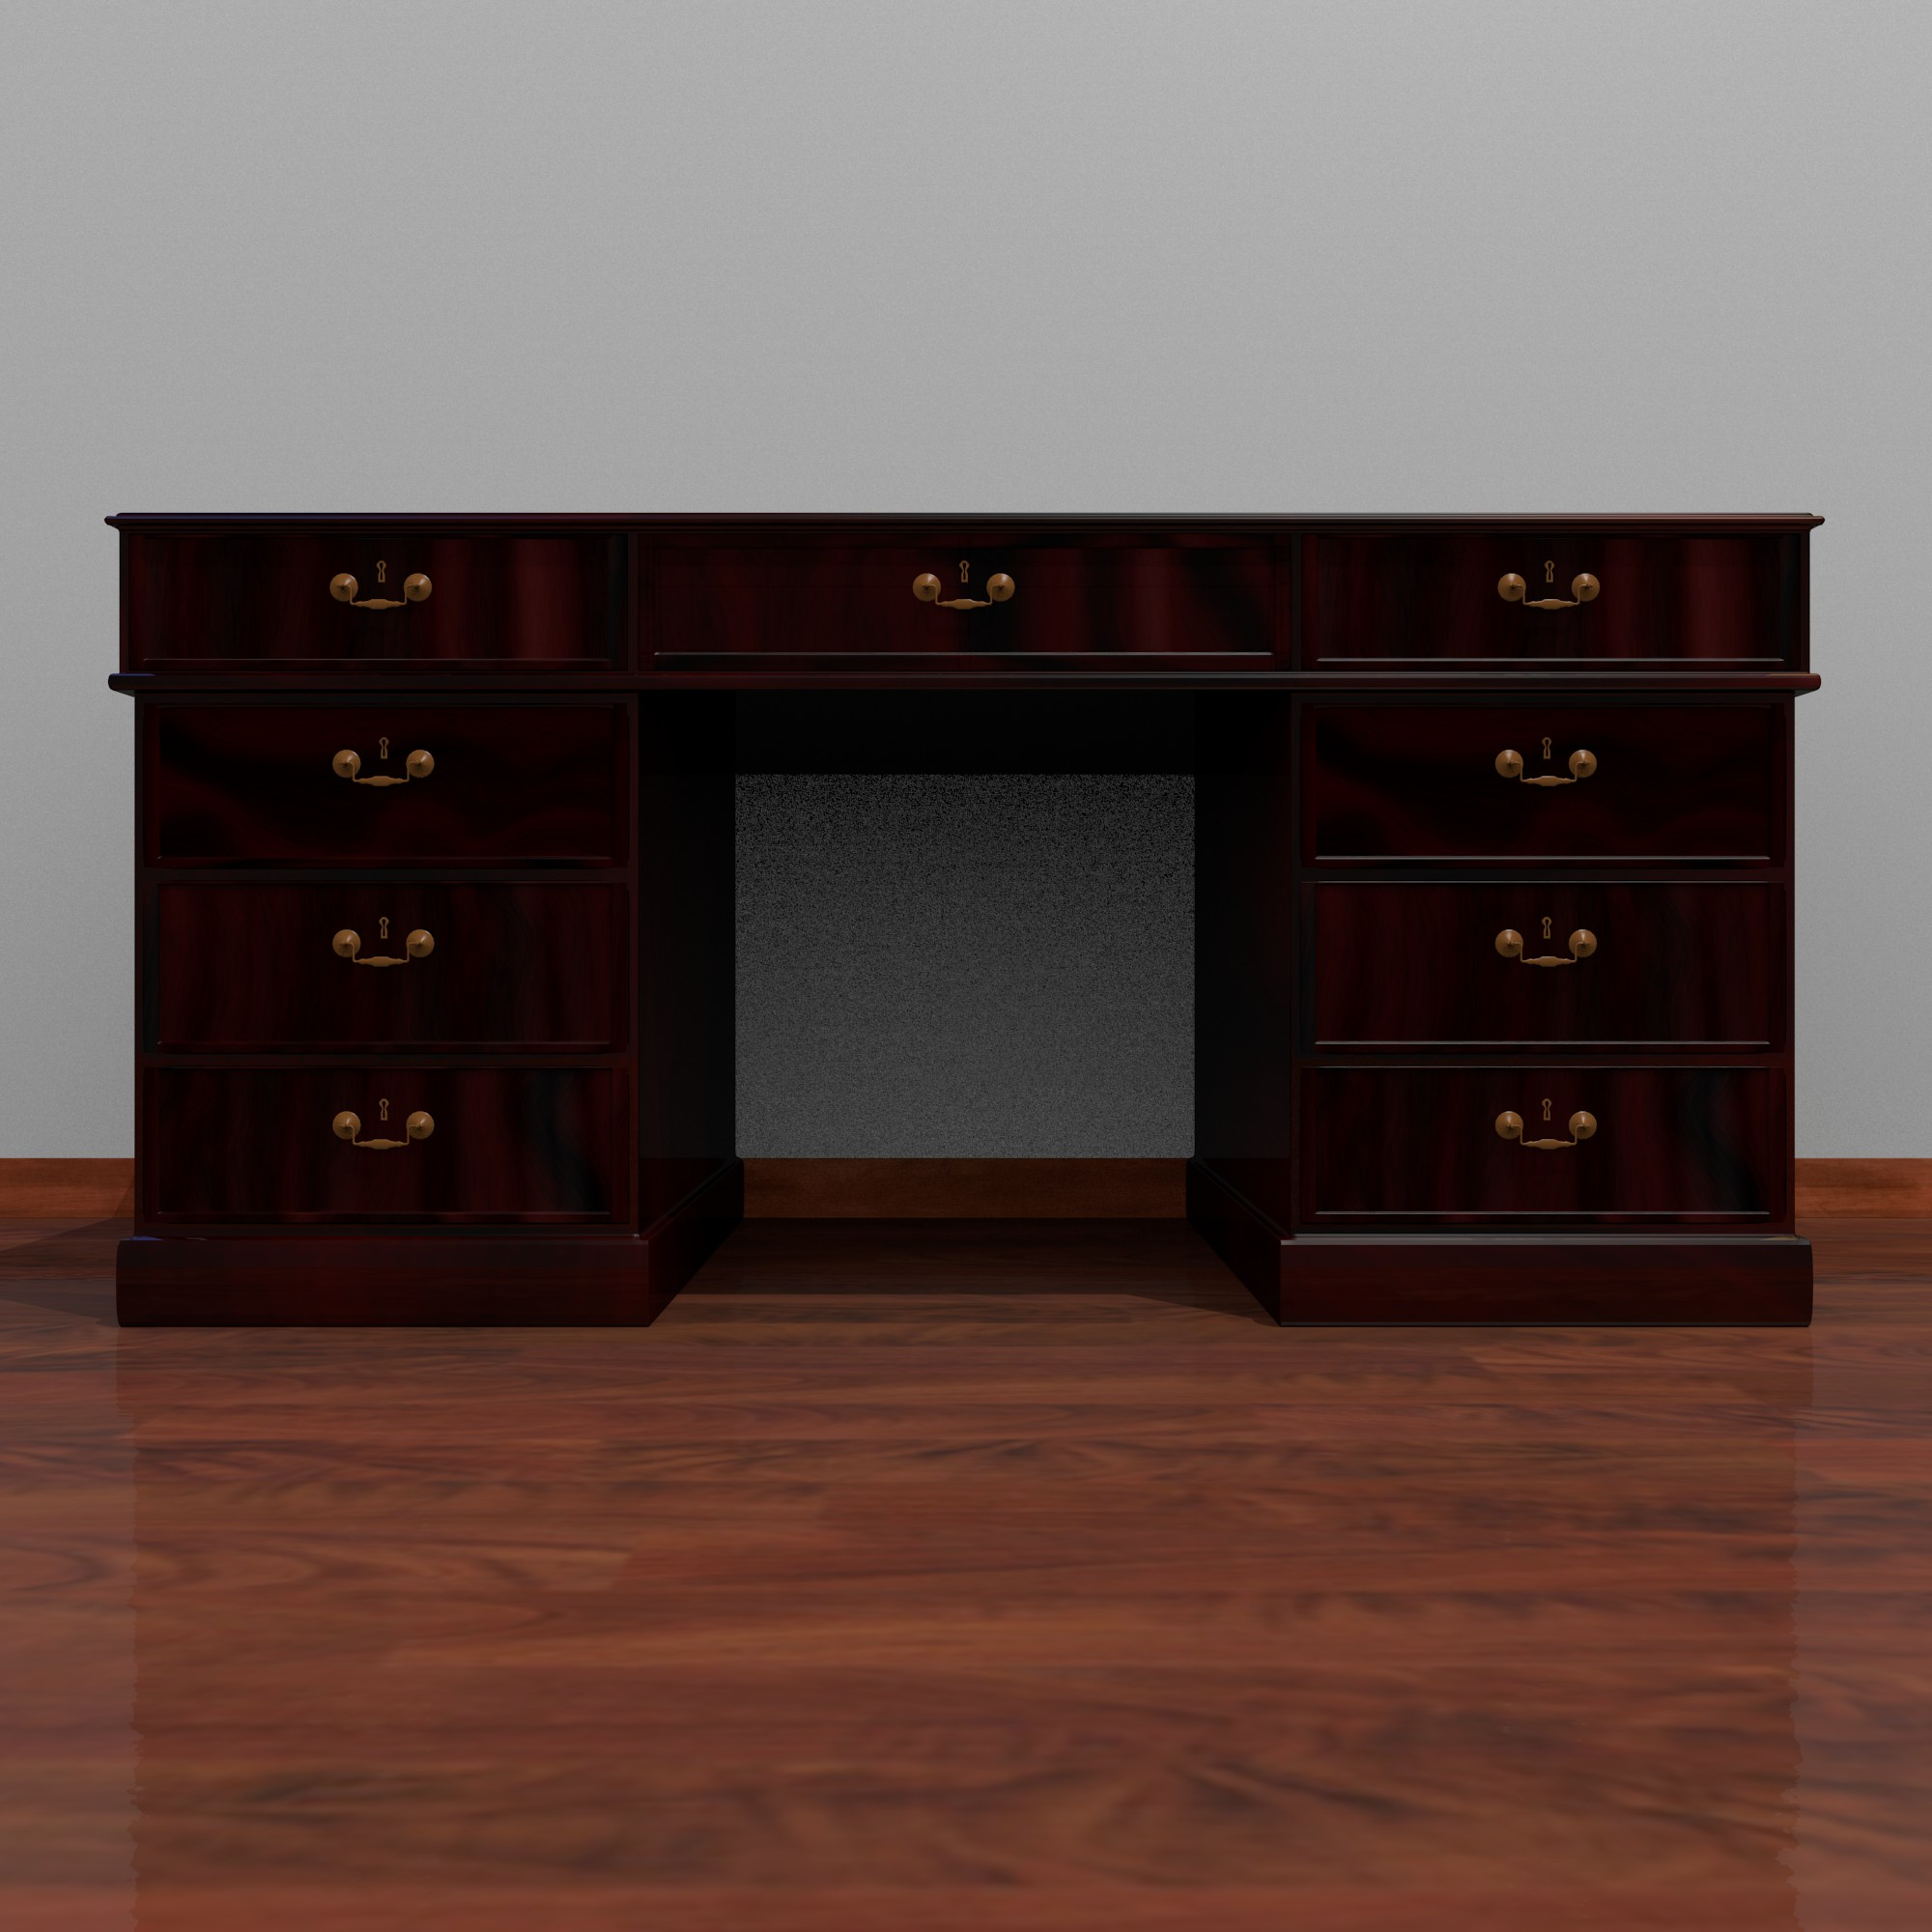 tumšs koka galds 3d modelis fbx maisījums dae obj 117672